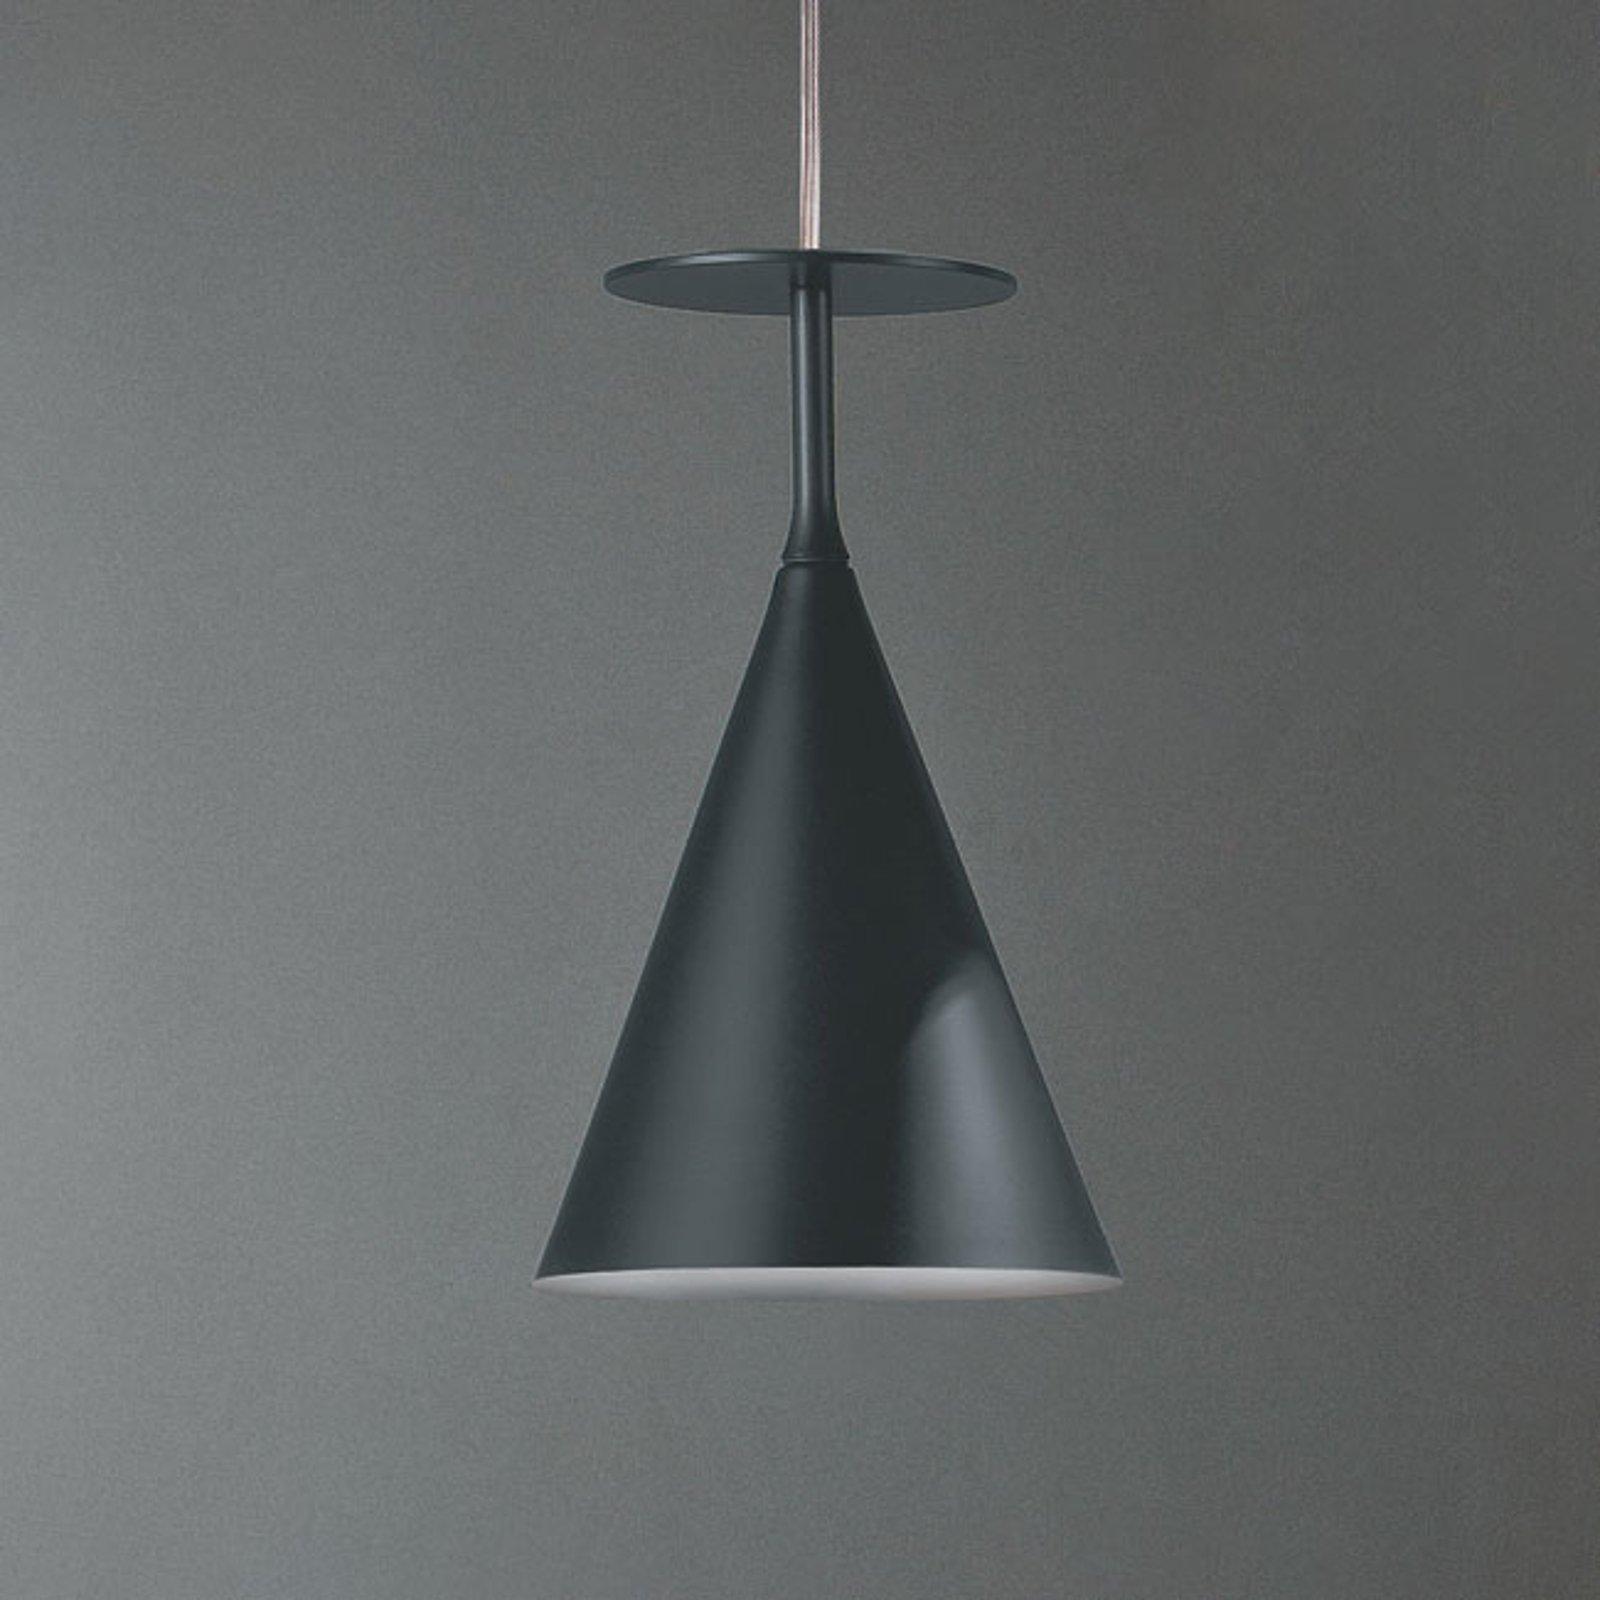 Modo Luce ABC Single B hengelampe blygrå